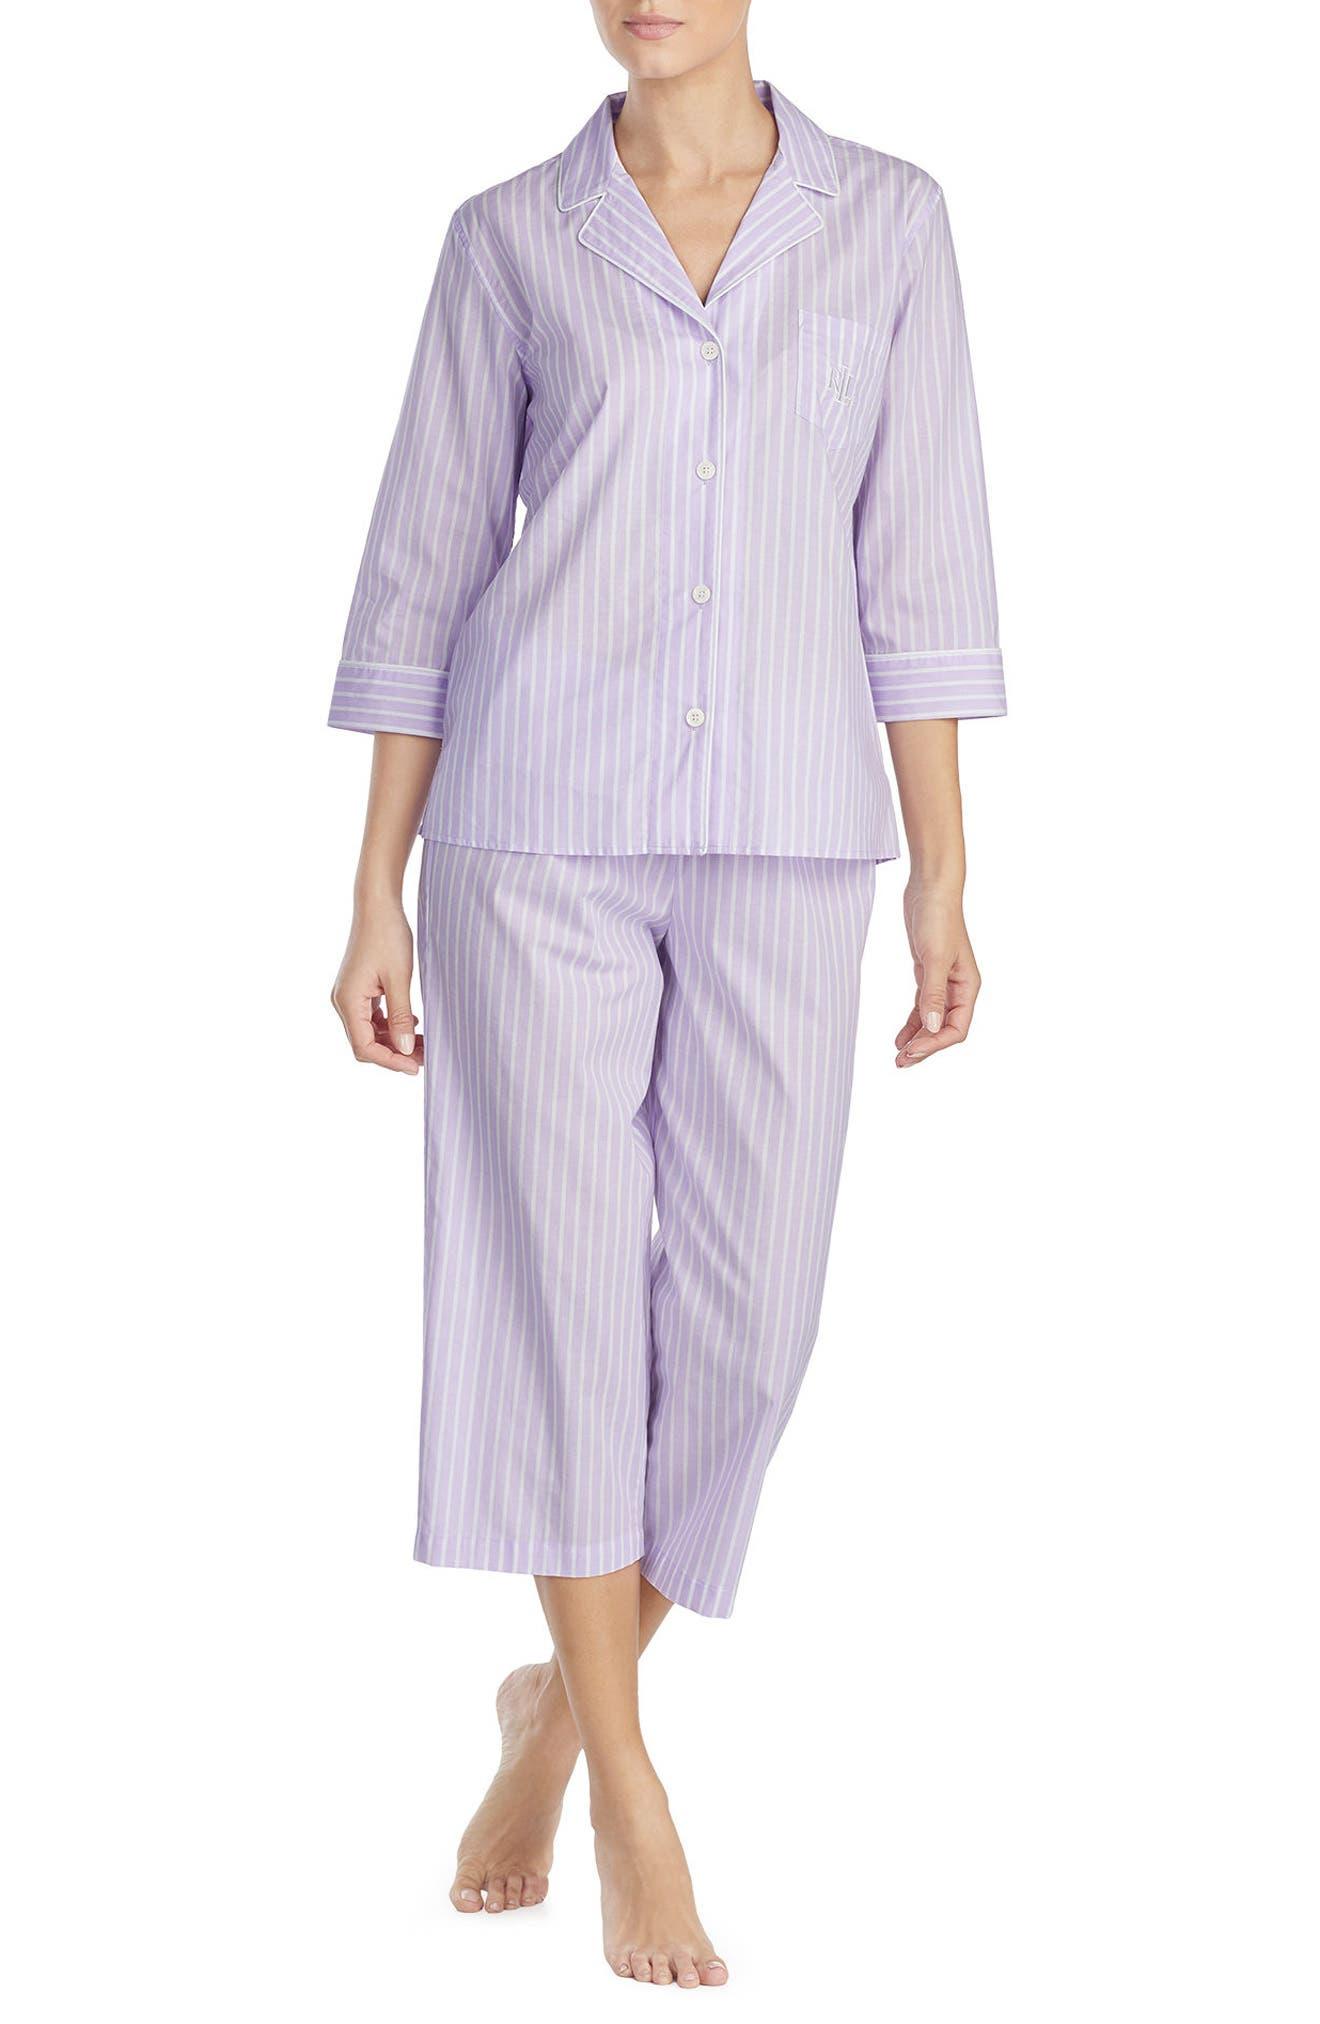 Capri Pajamas,                             Main thumbnail 1, color,                             537